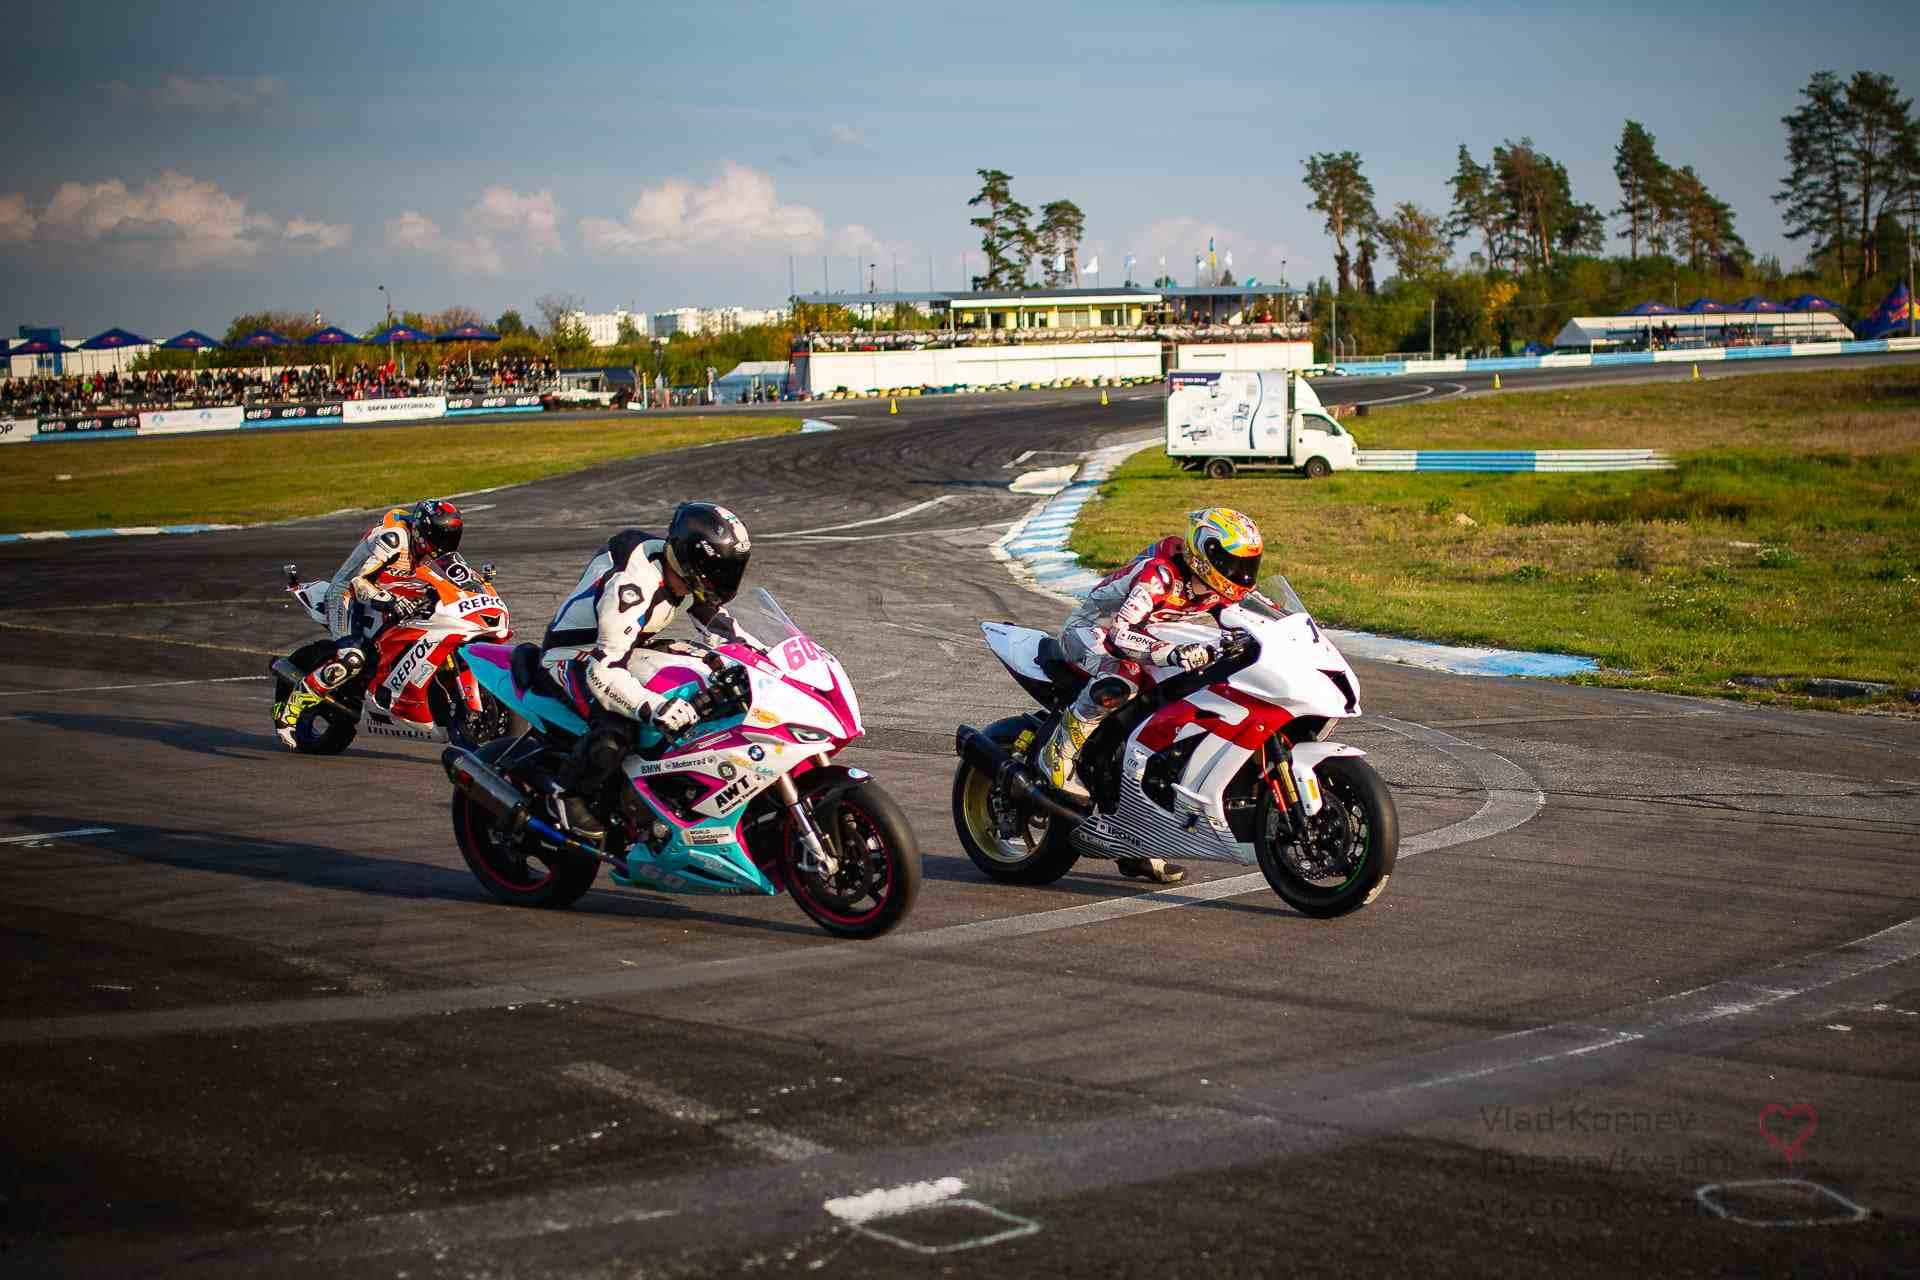 5-6_etap_MotoGPUkraine_036